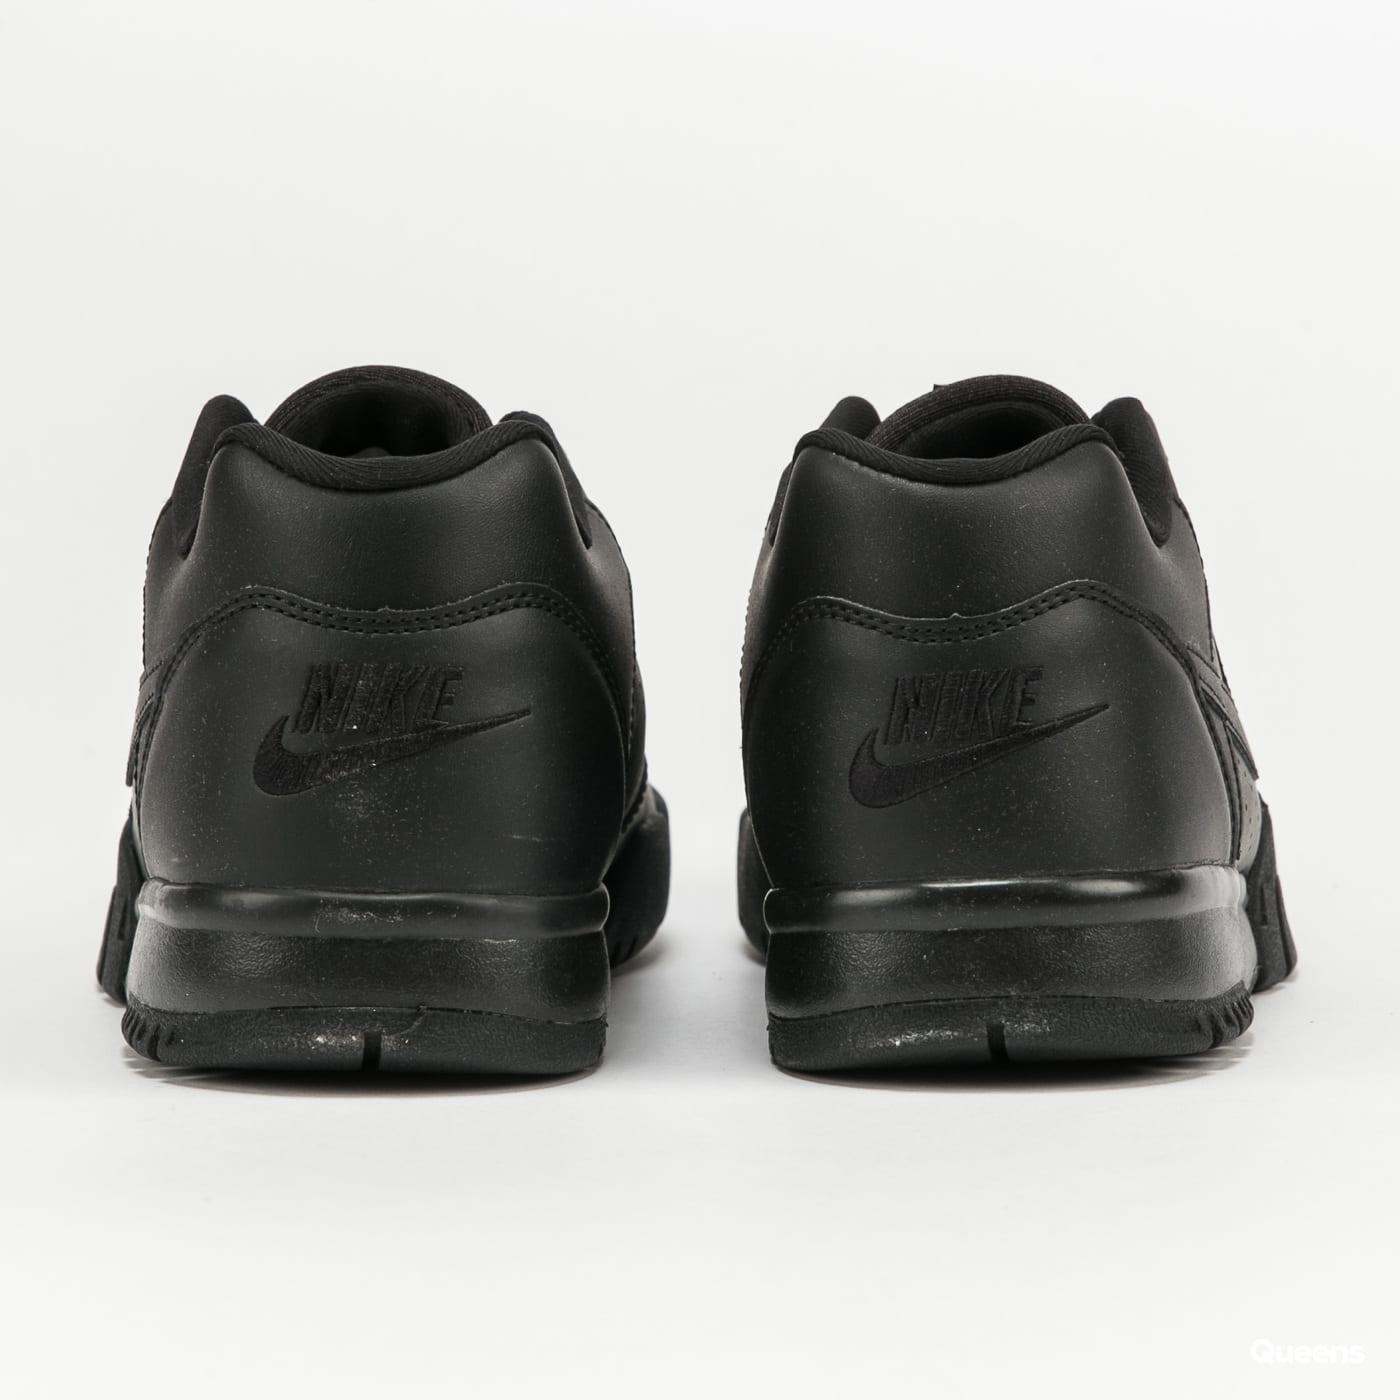 Nike Cross Trainer Low black / black - black - off noir